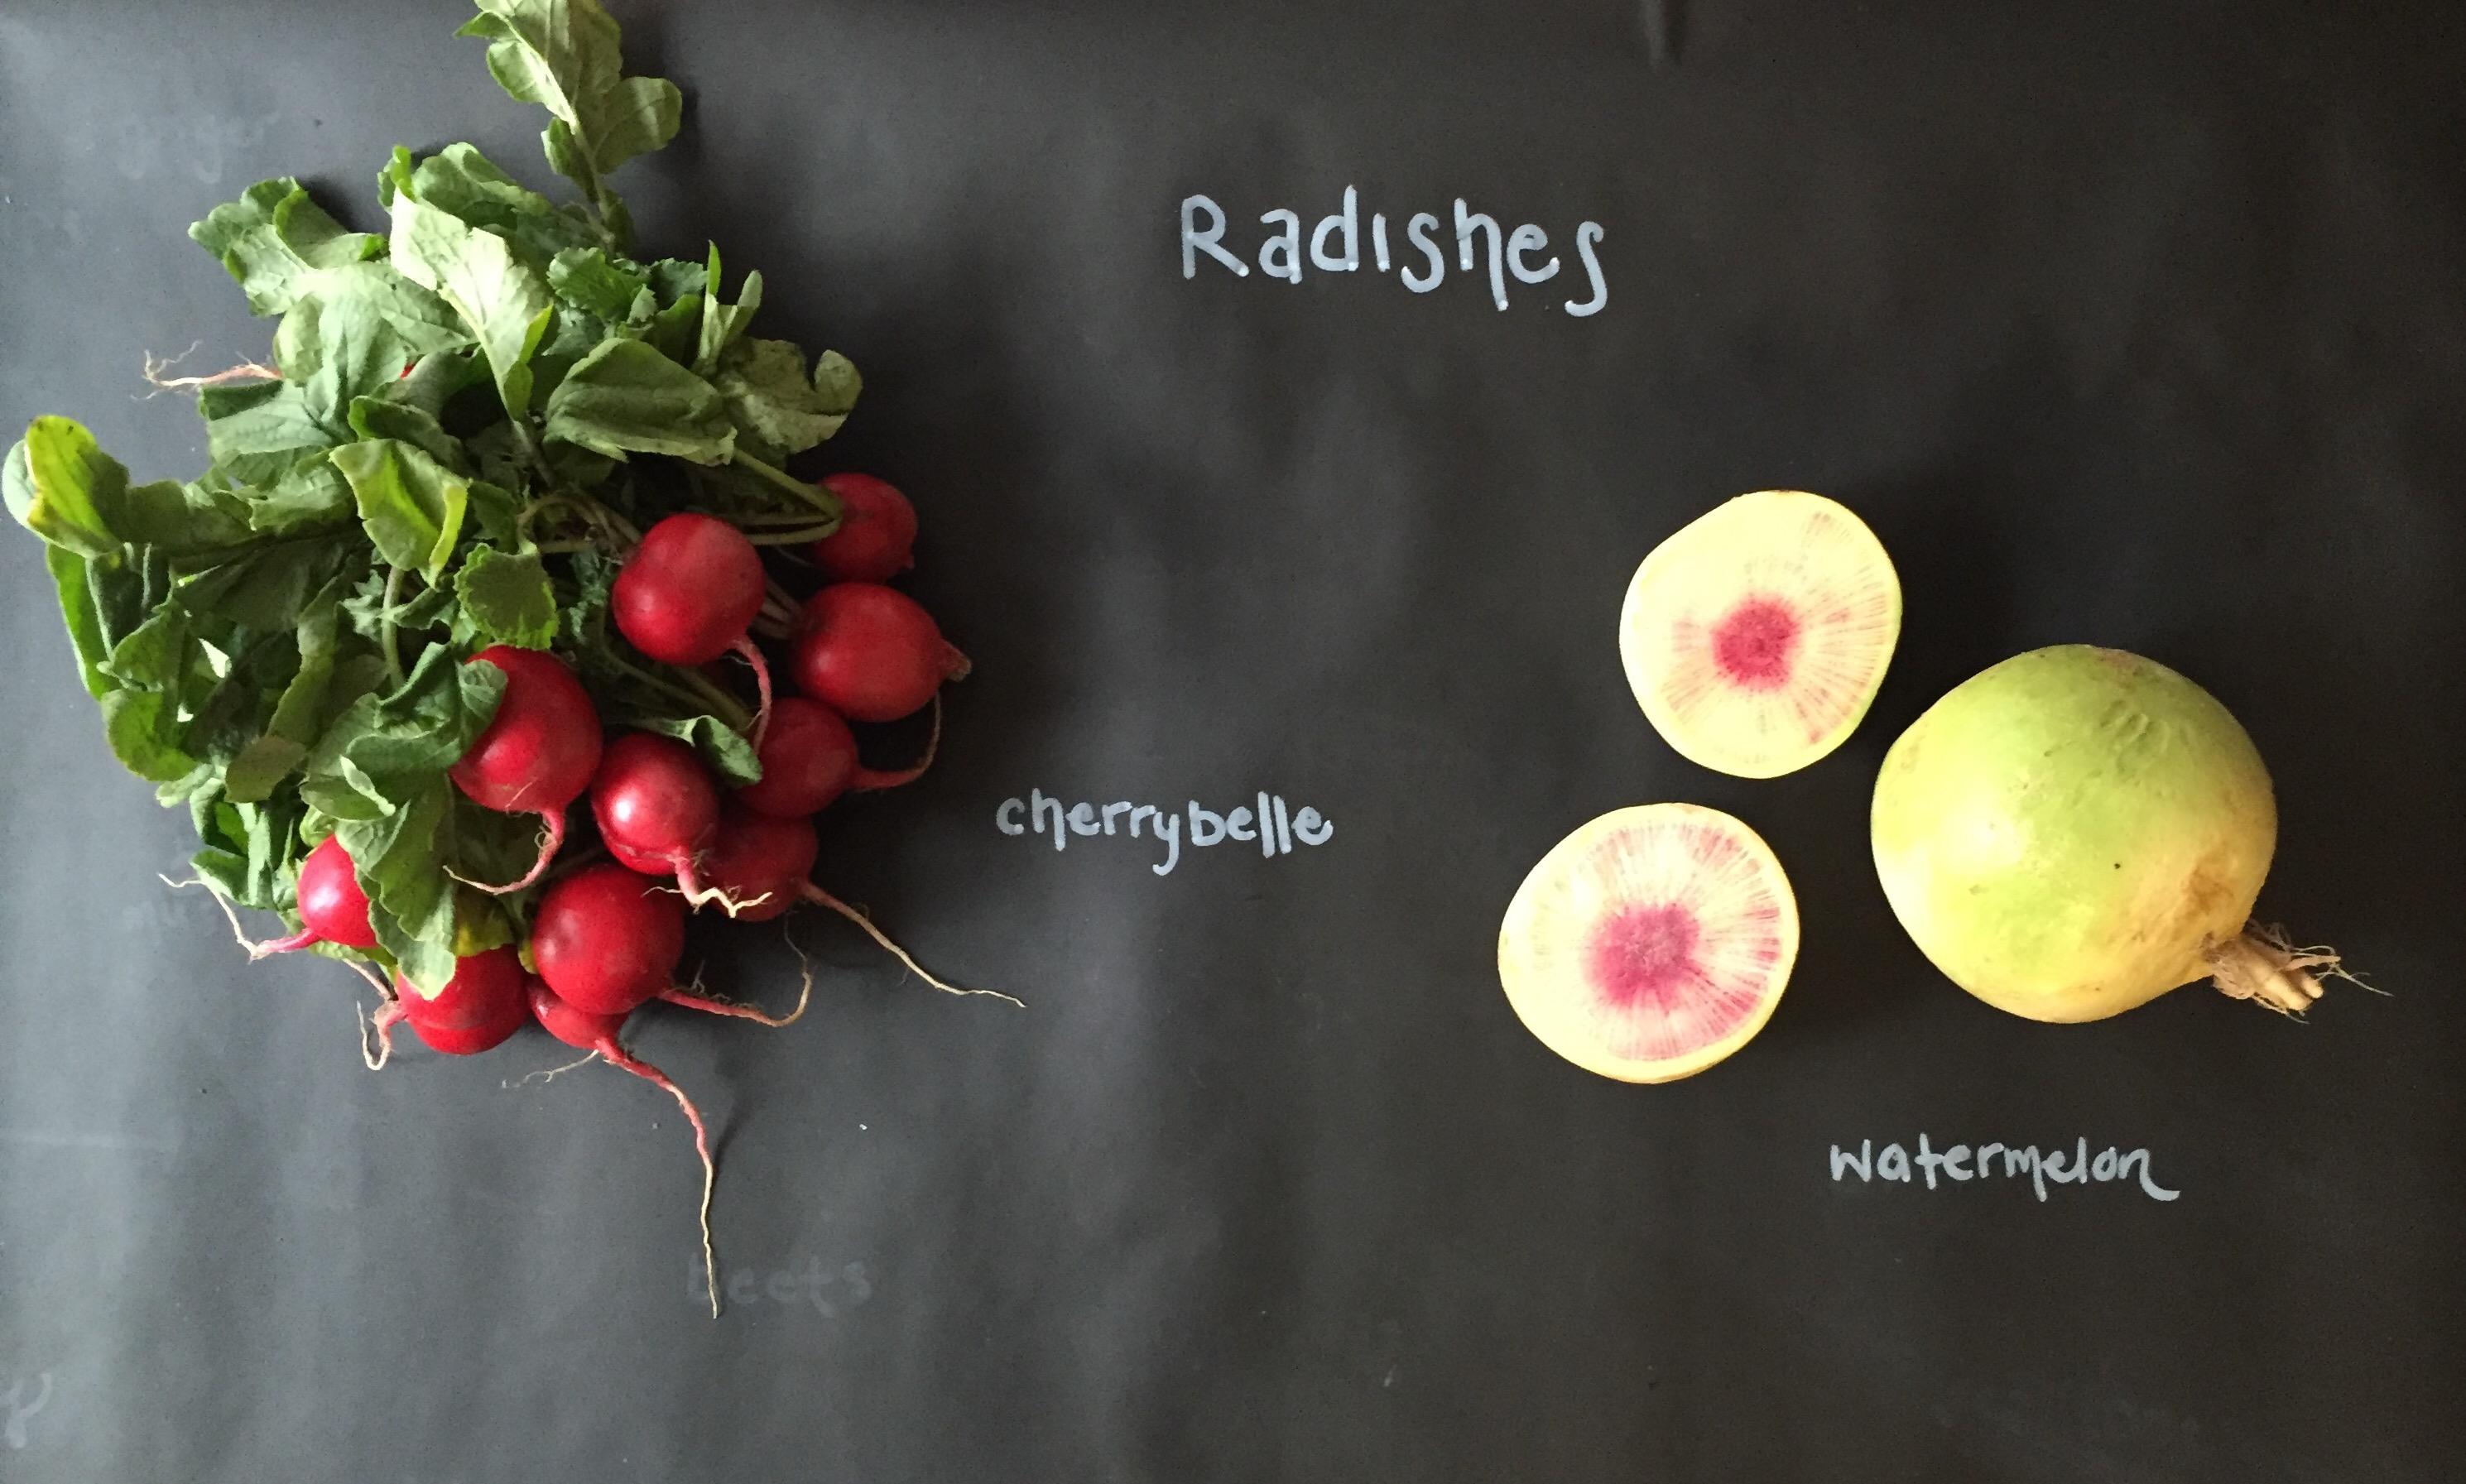 Featured Ingredient: Radishes